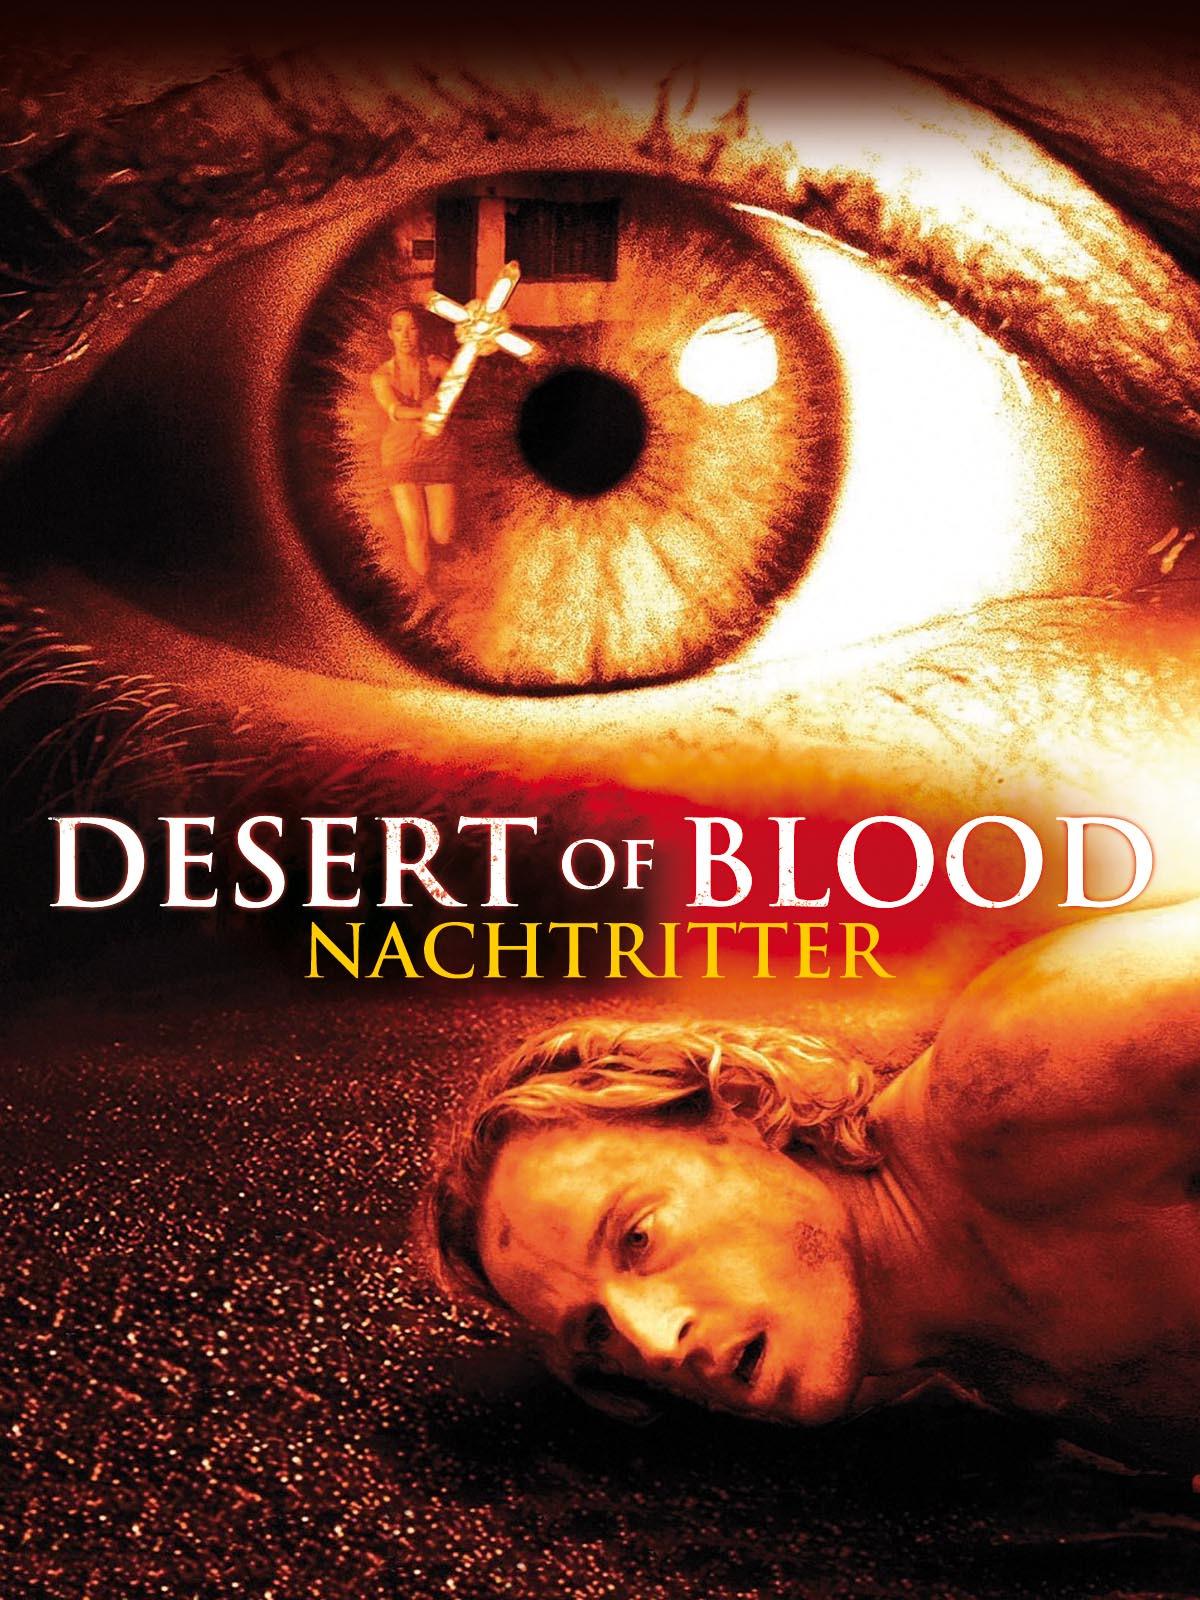 Desert of Blood - Nachtritter